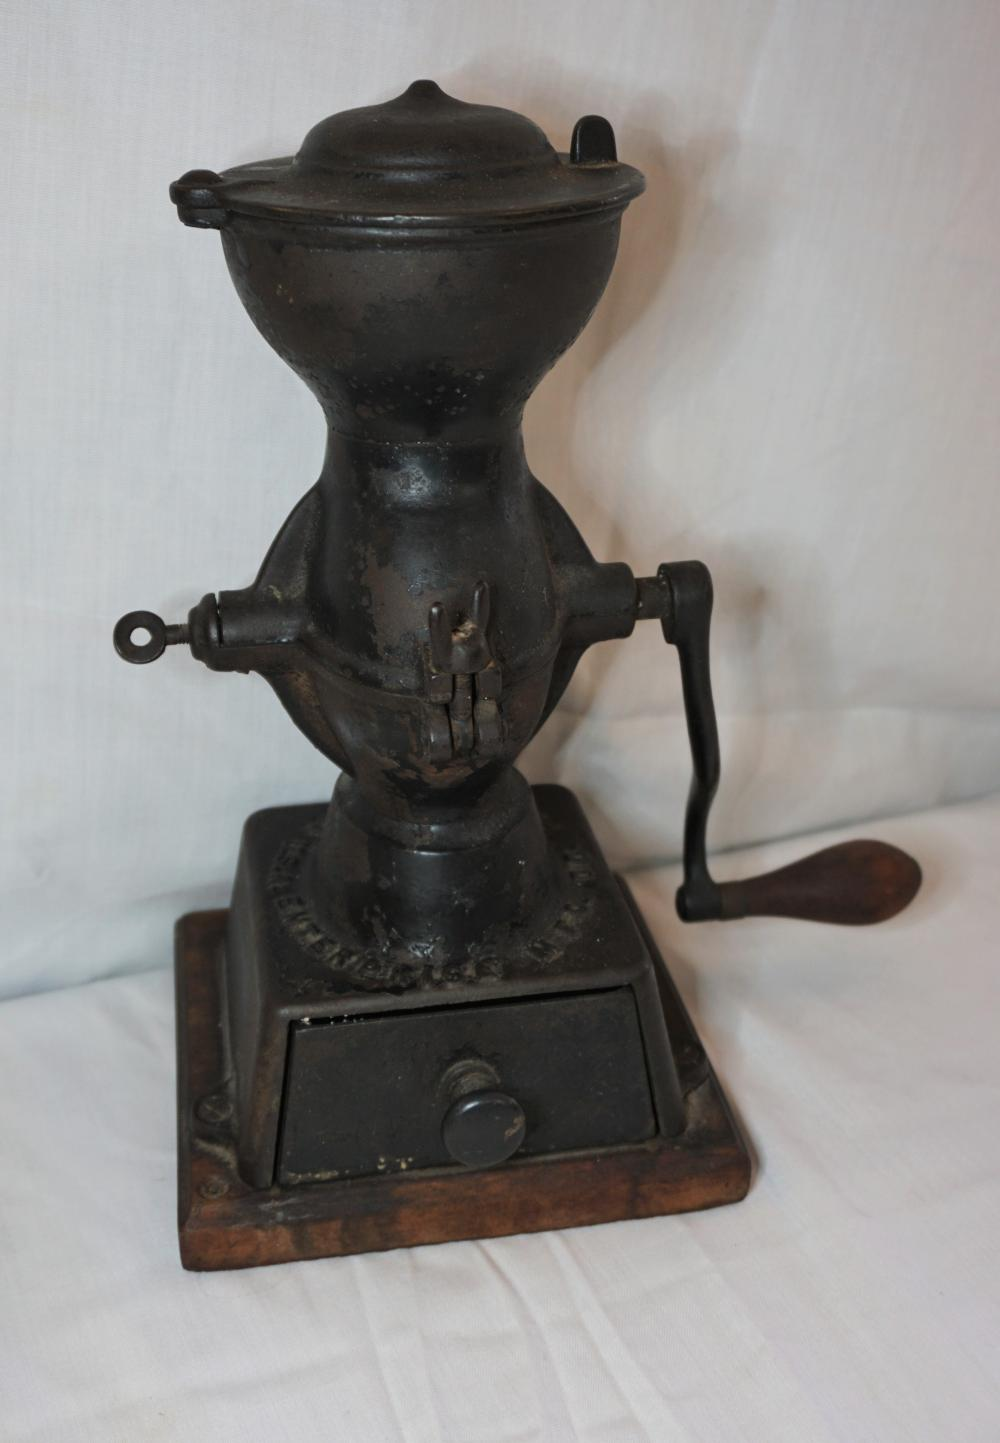 Enterprise cast iron coffee grinder